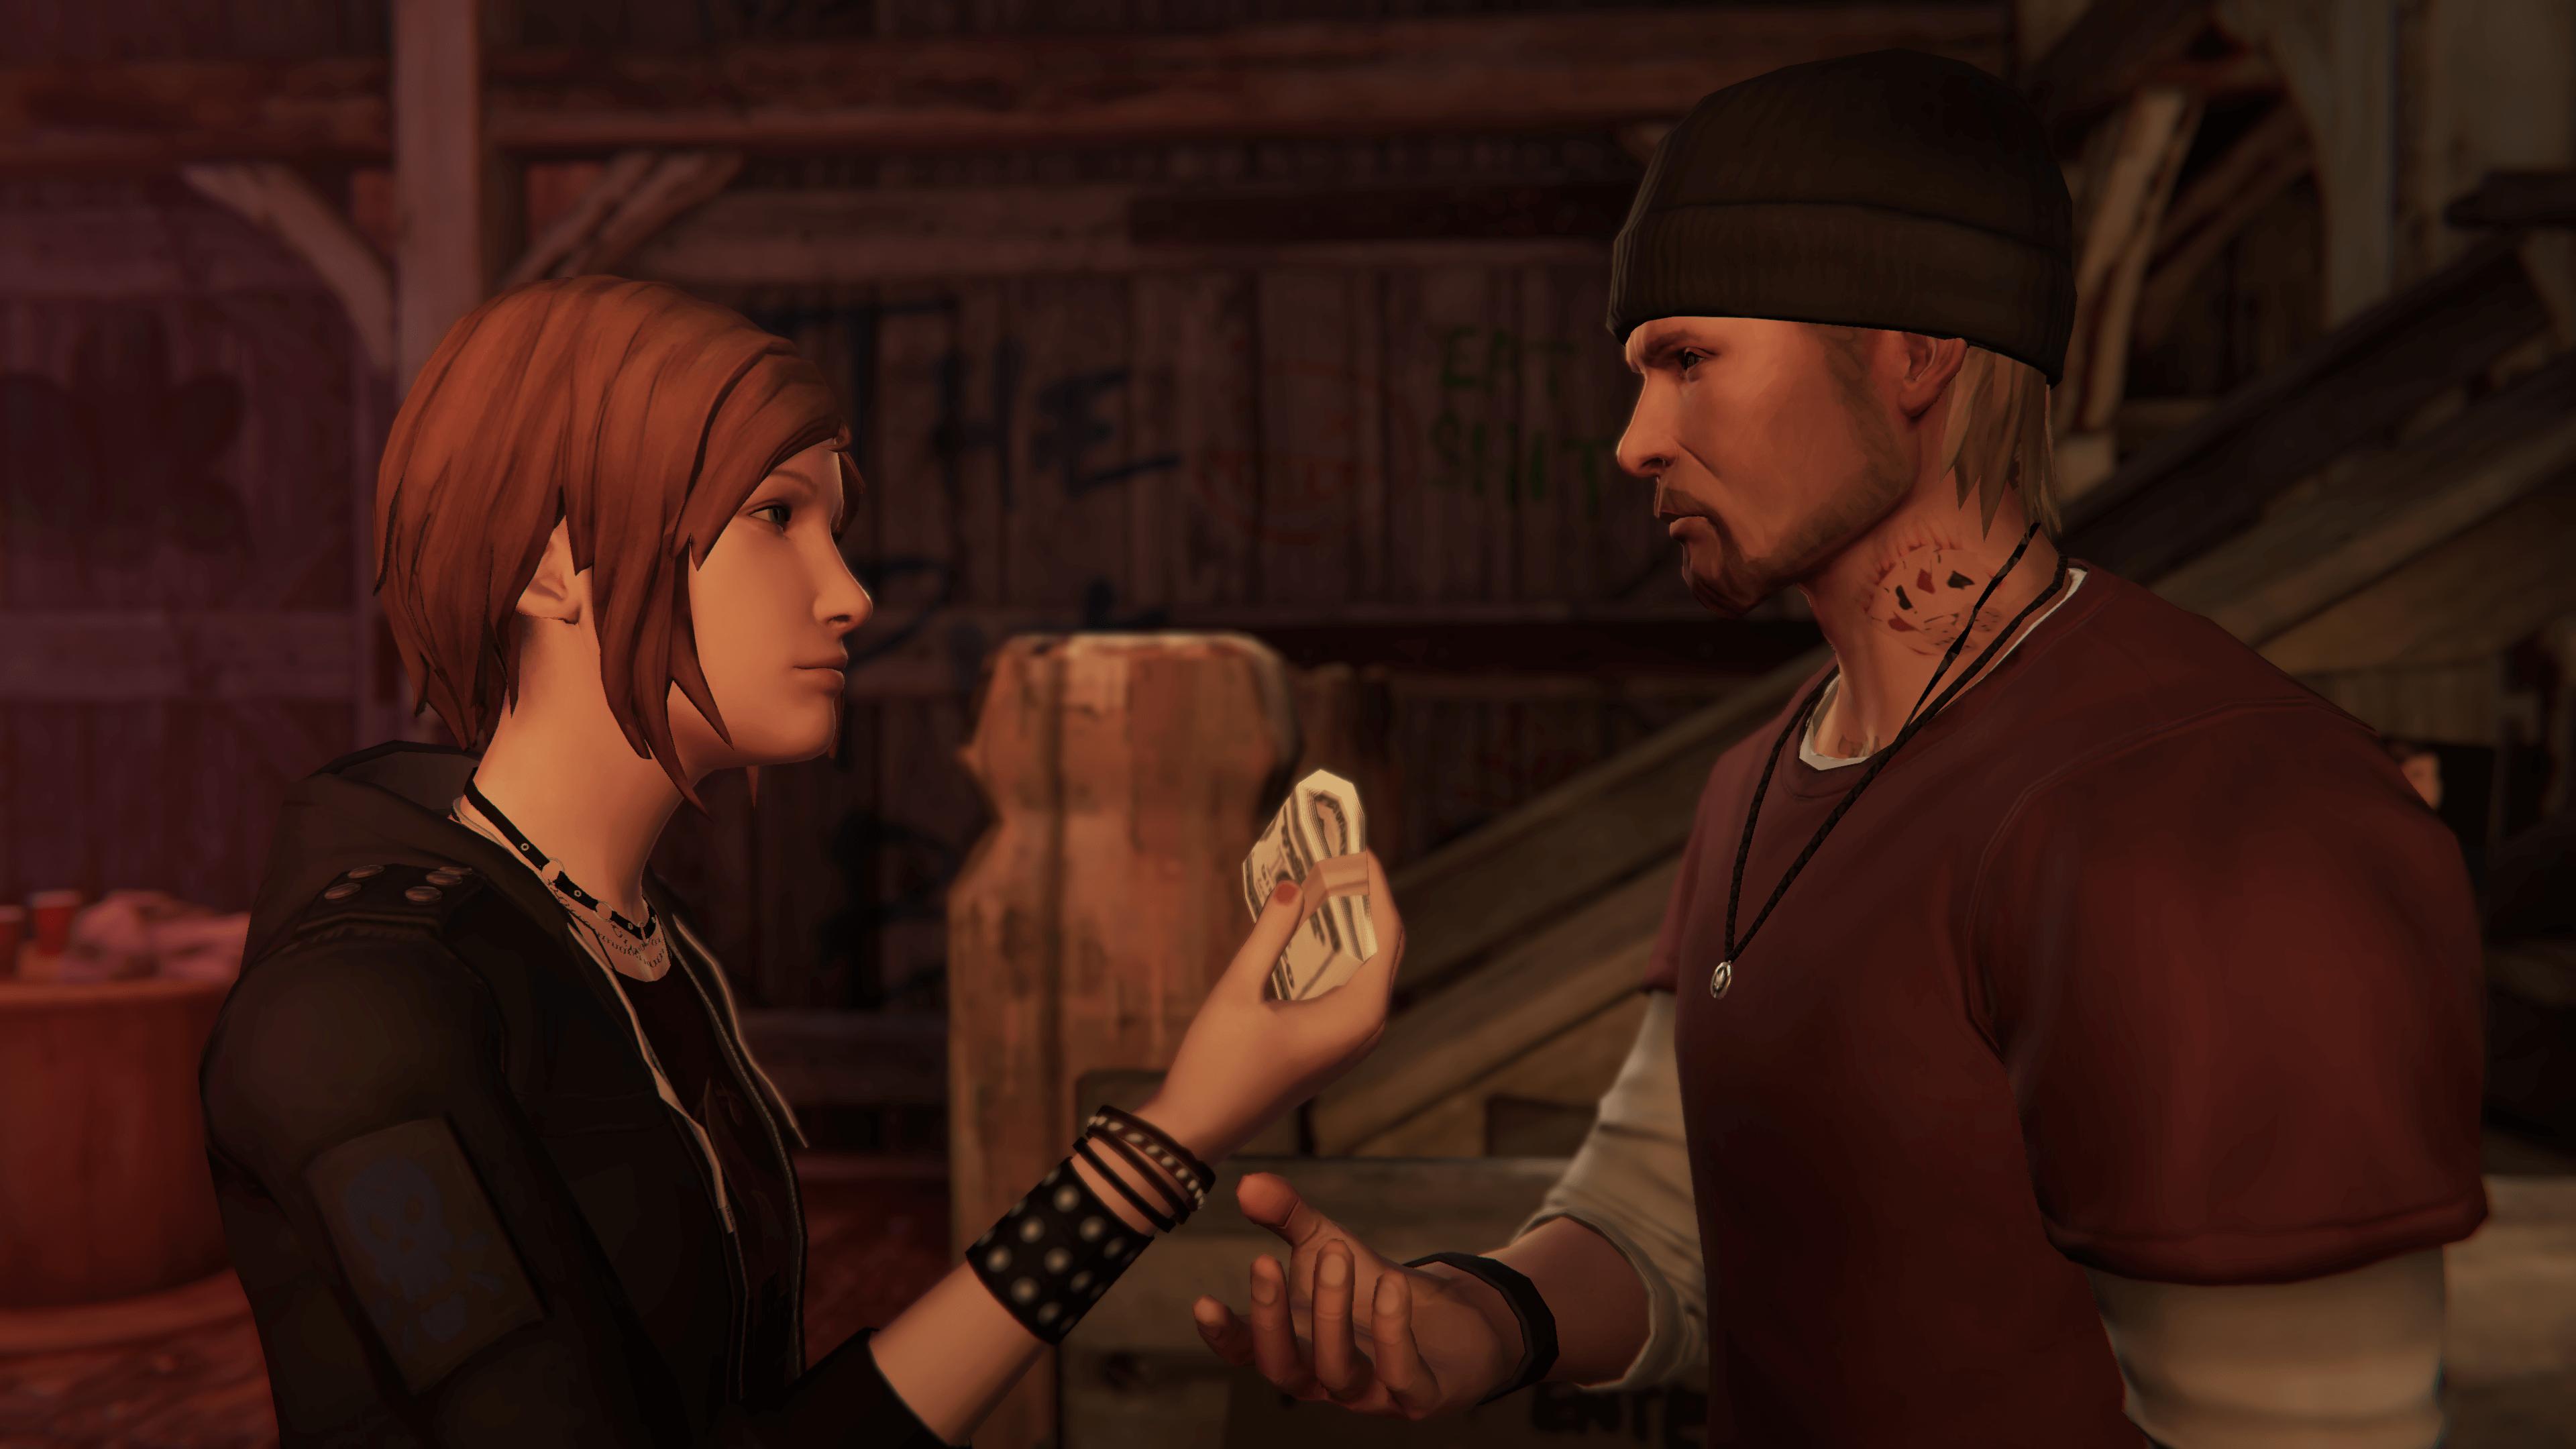 Chloe and Frank money